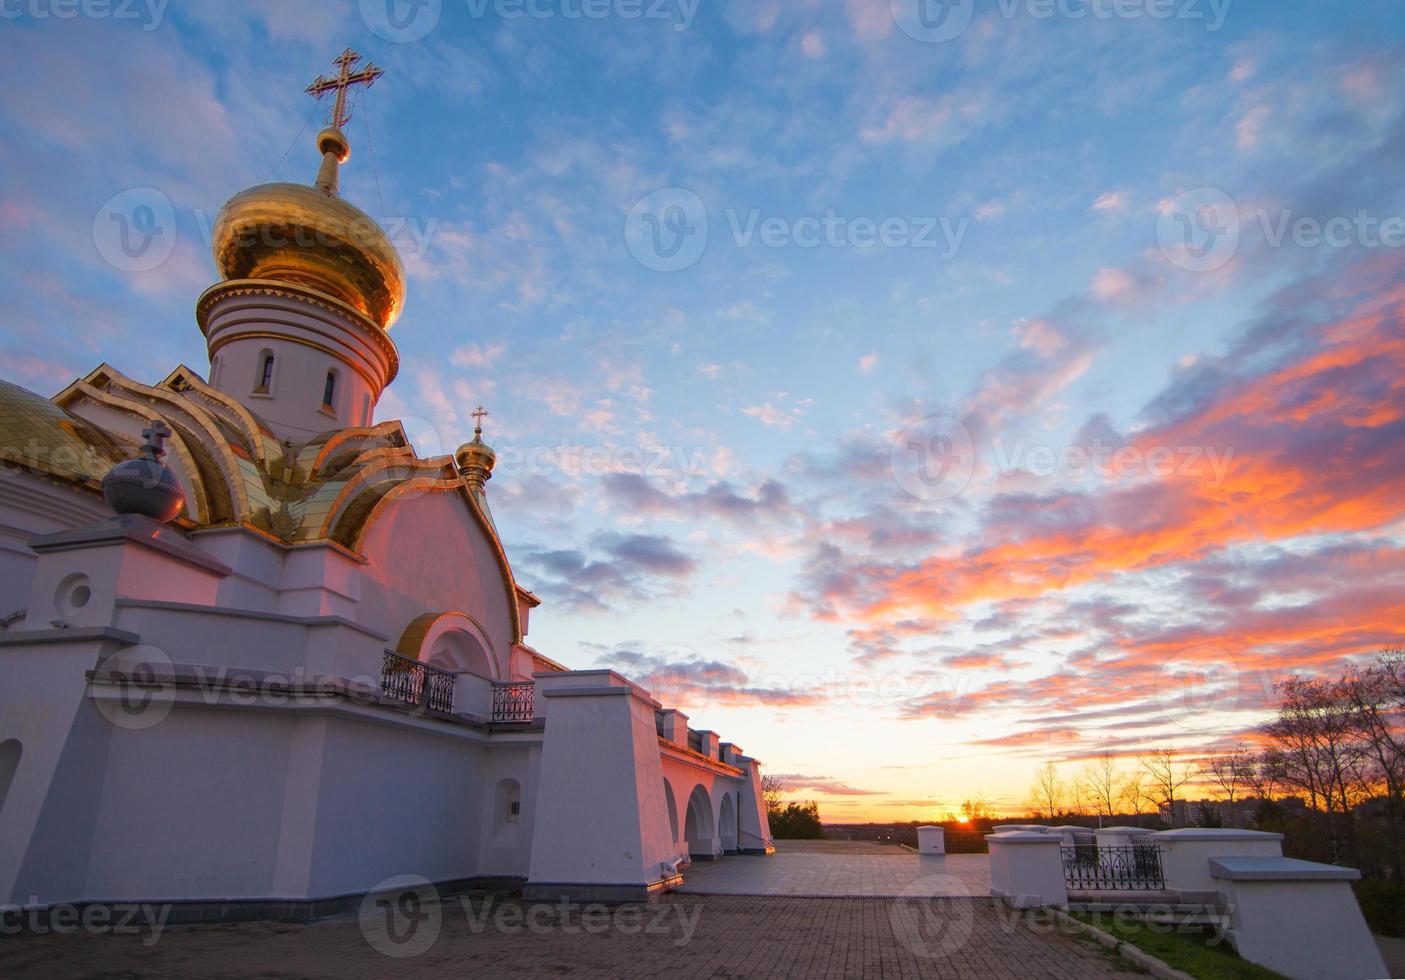 serafim sarovsky tempel op zonsondergang in Chabarovsk, Rusland foto